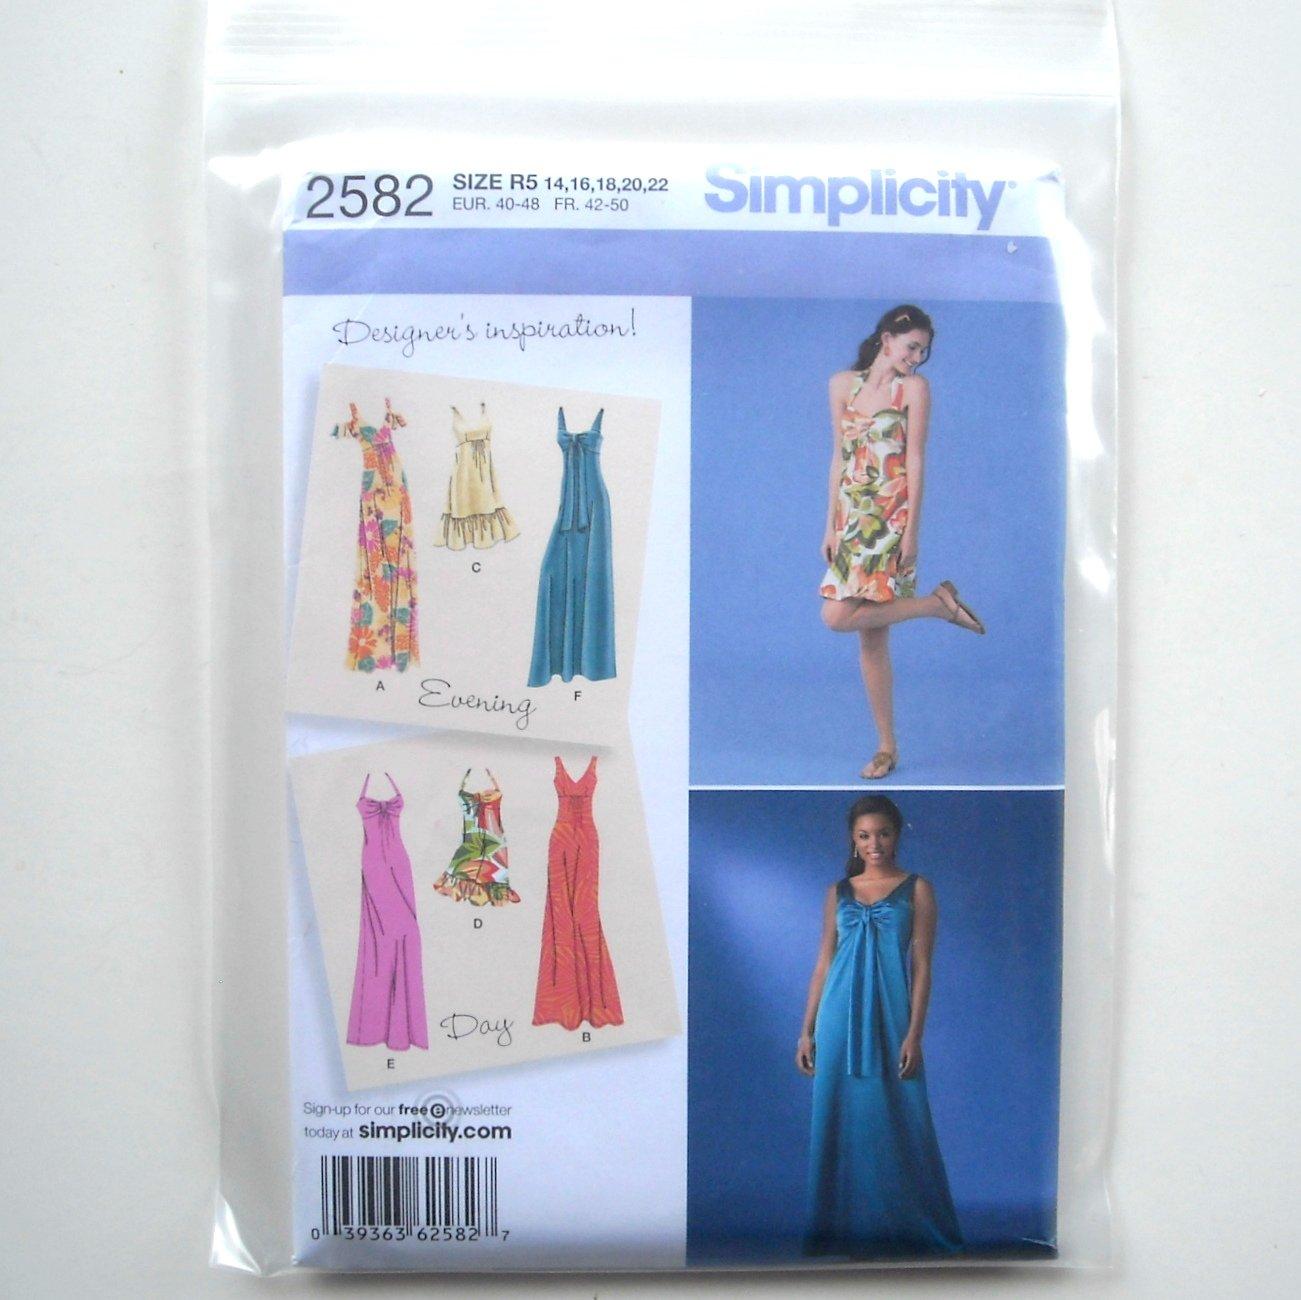 Simplicity Pattern 2582 Size 14 - 22 Designer's Inspiration Misses Miss Petite Day Evening Dresses